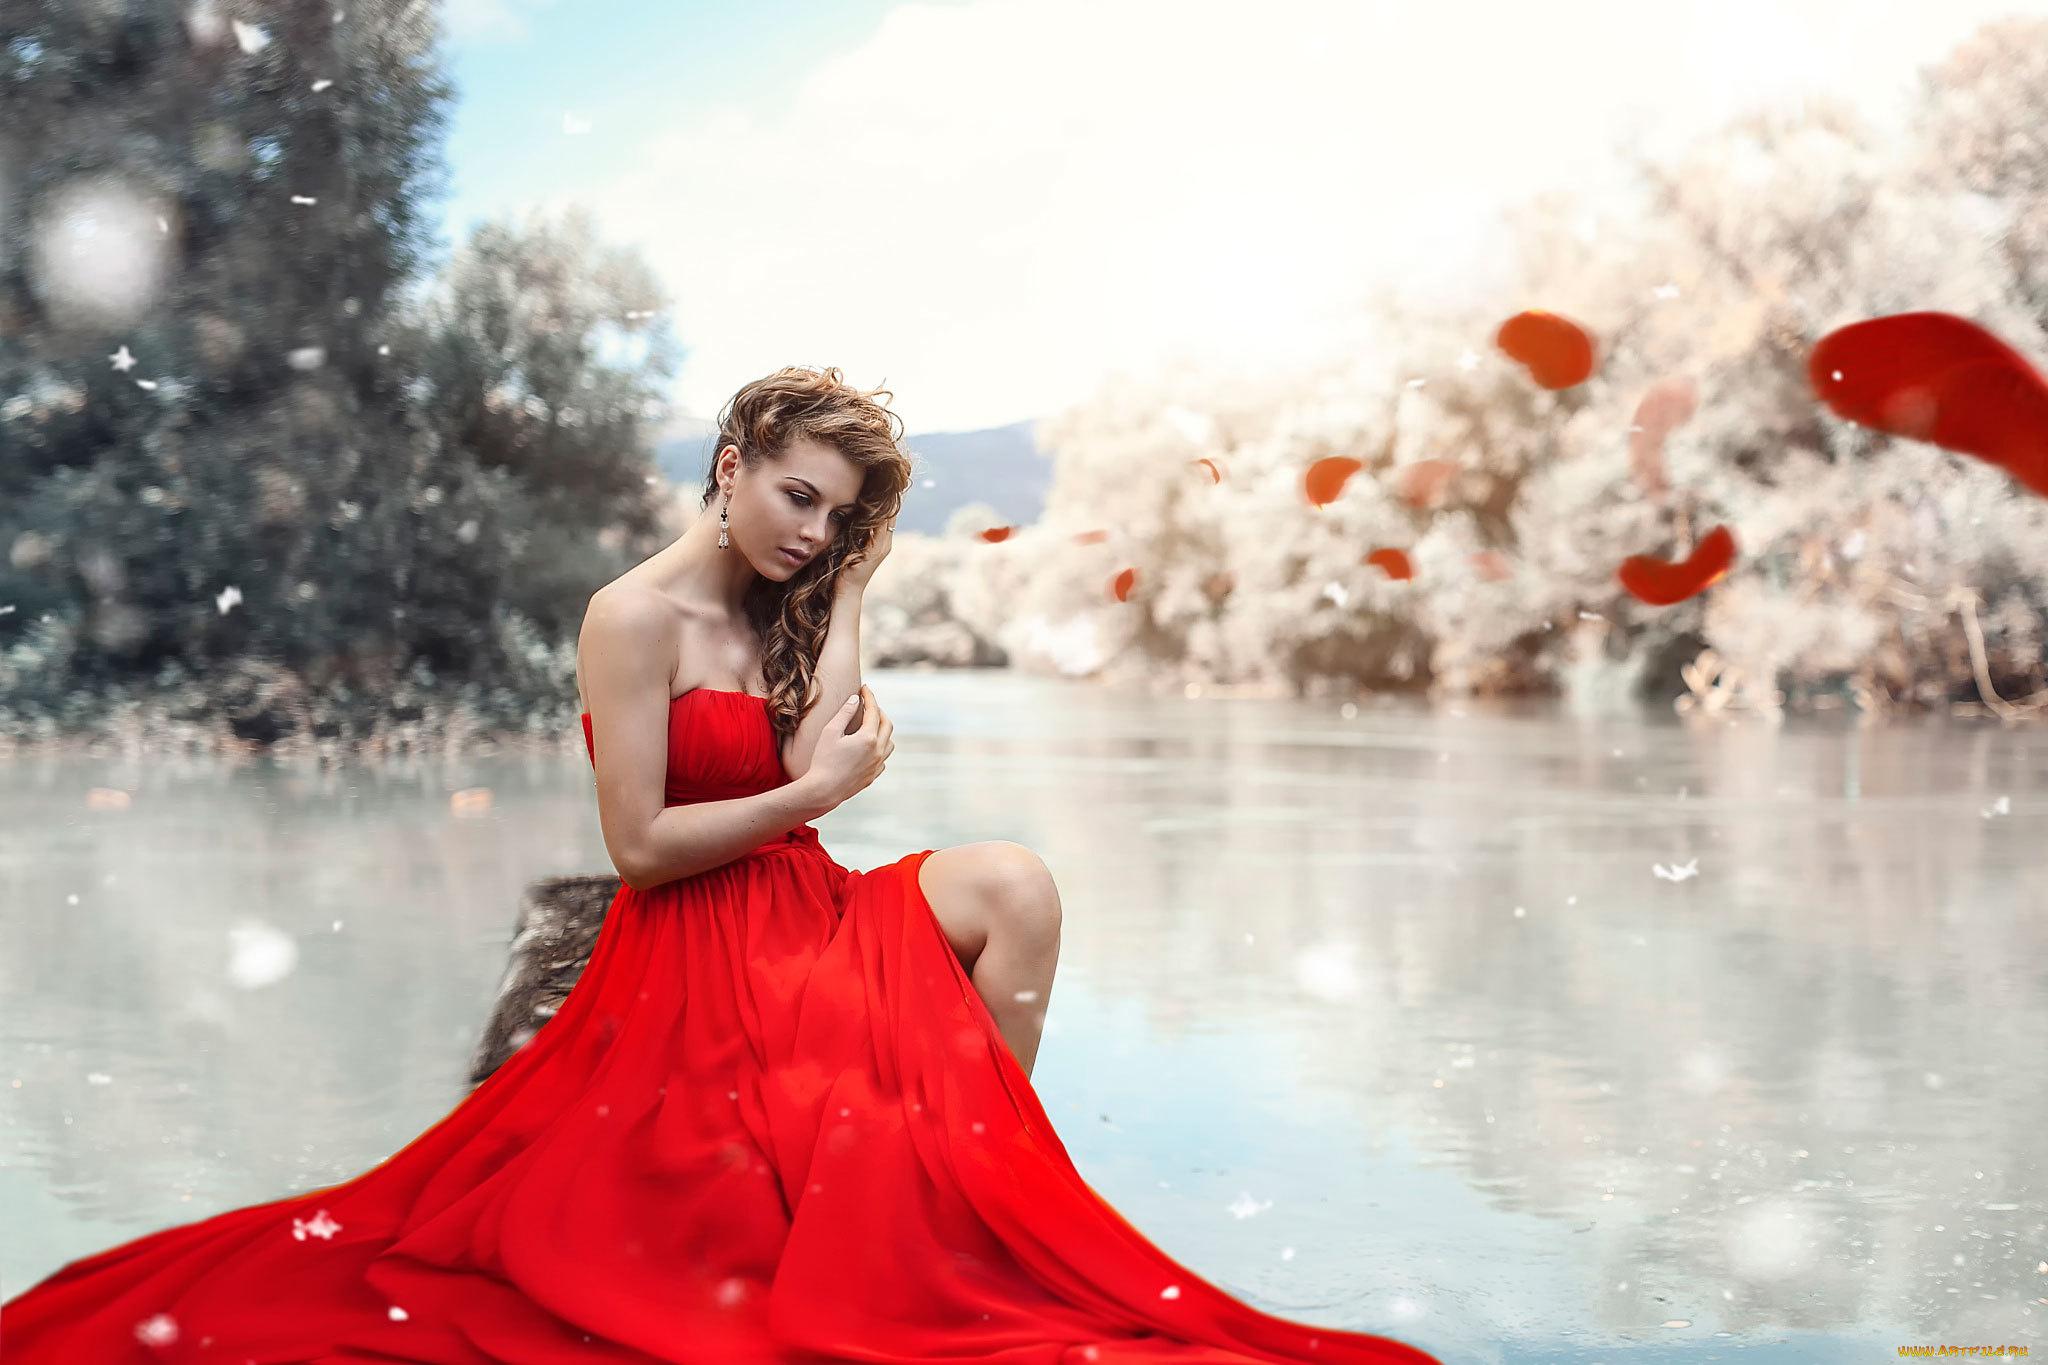 девушка зима платье красное лес без смс